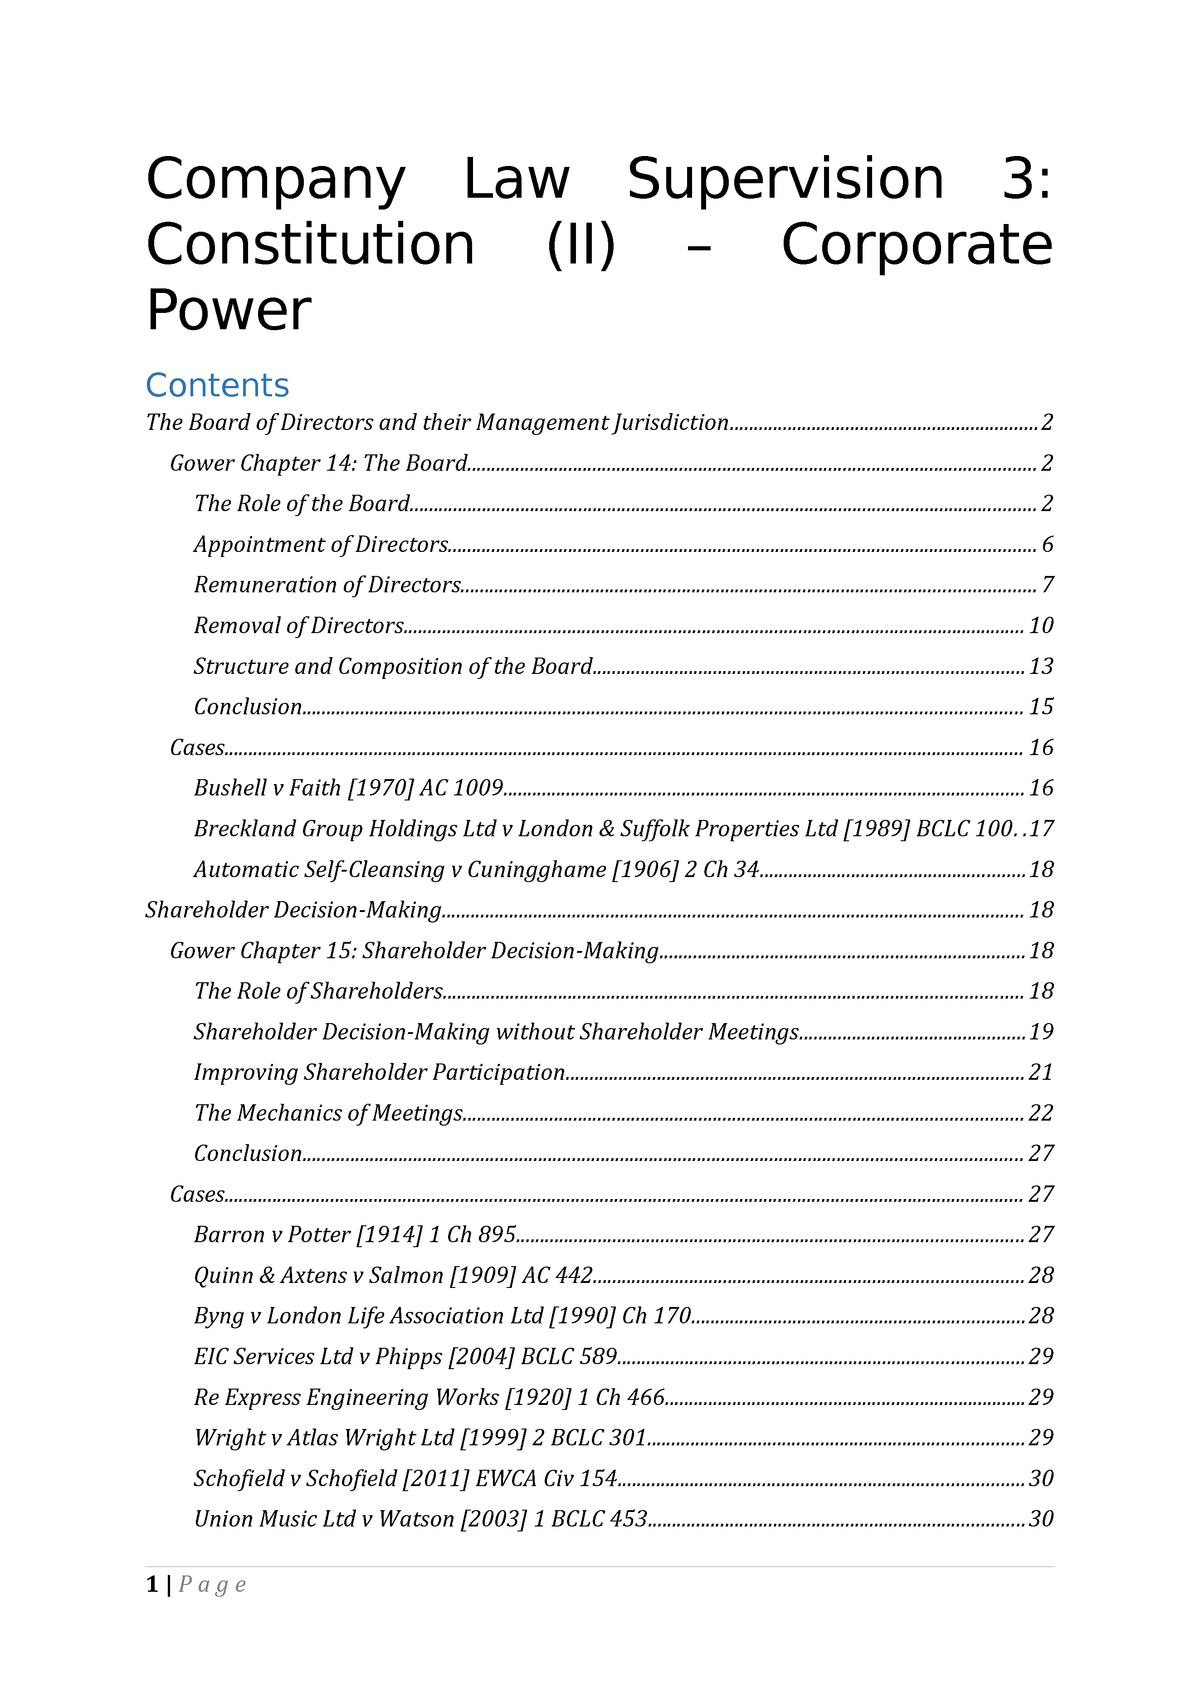 Company Law Supervision 3 Notes - Law L100 - CAM - StuDocu